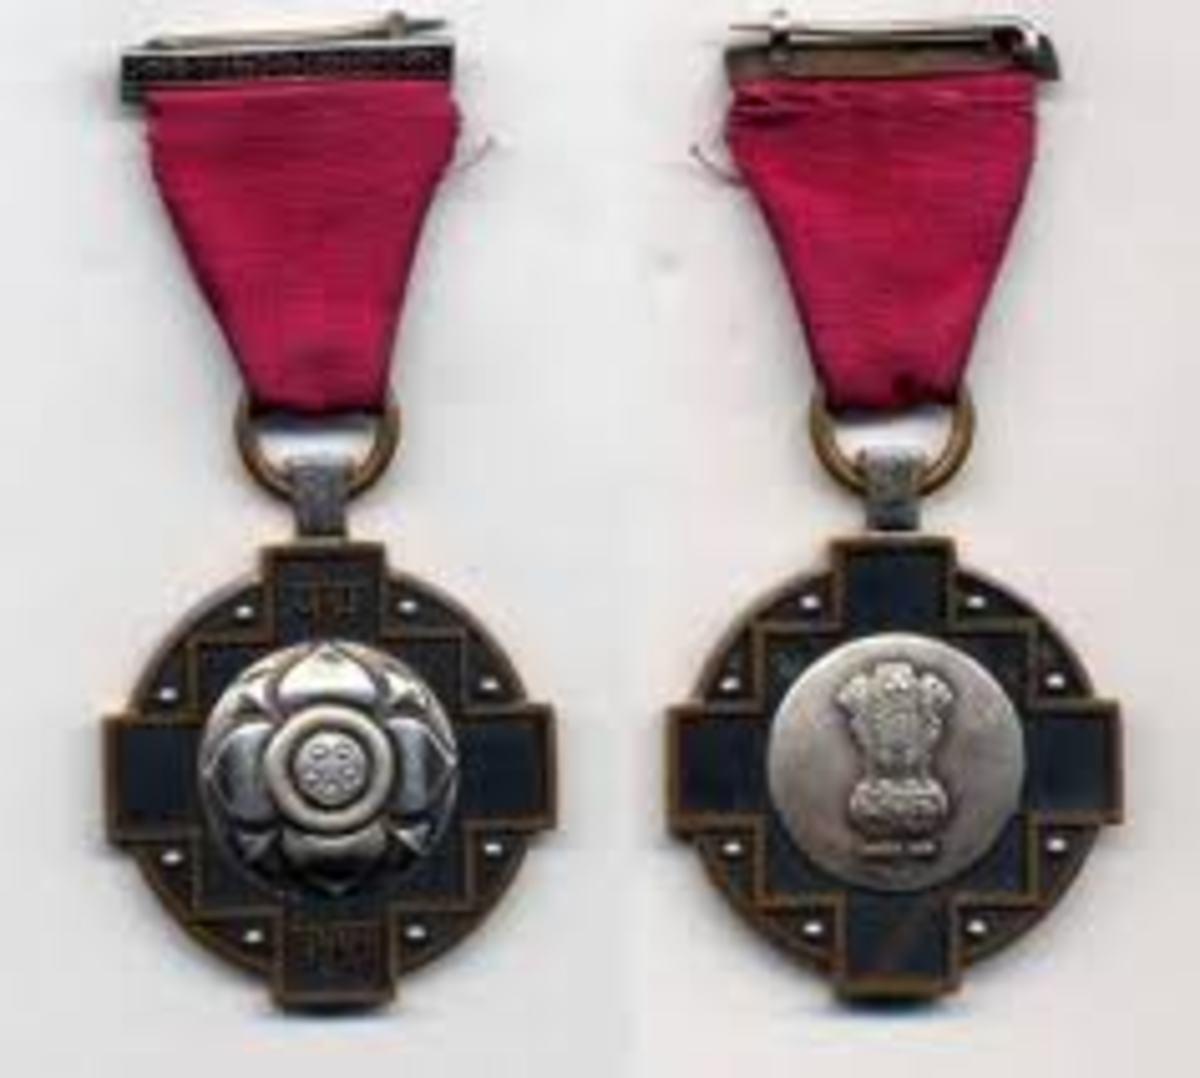 Padma Vibhushan Medal